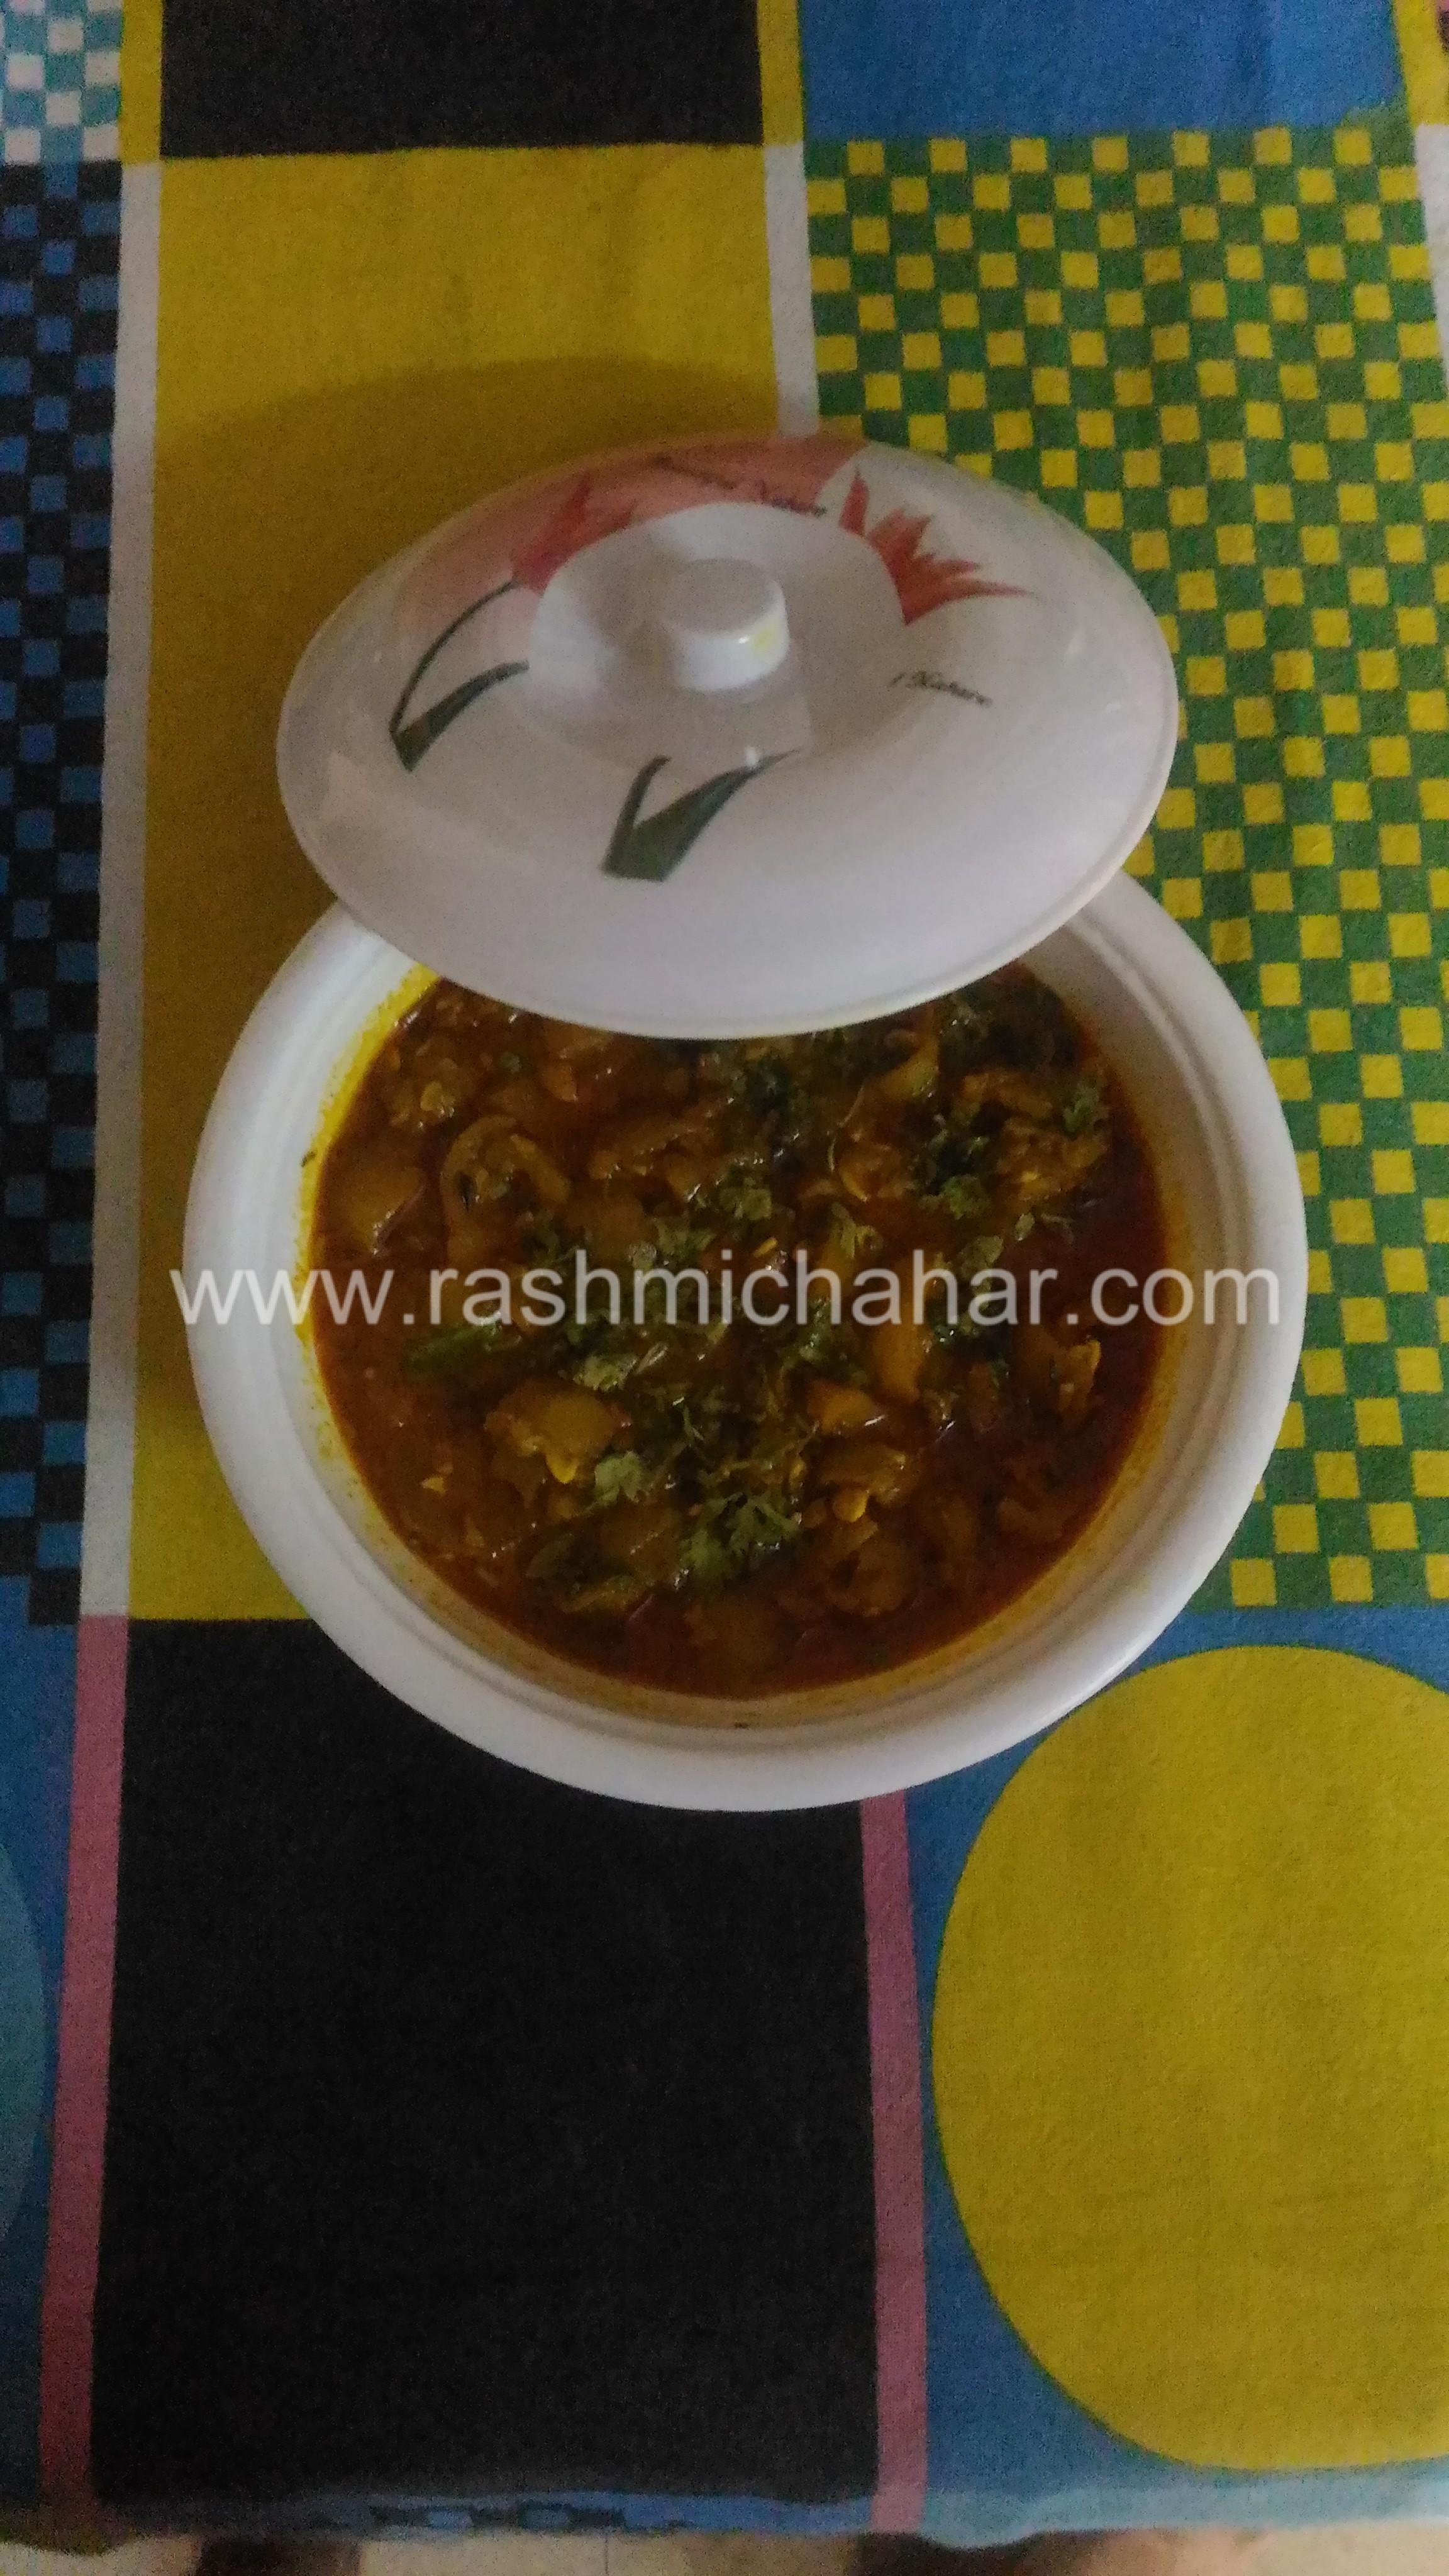 टिंडे की सब्जी बनाना | How to make Tinda Sabji